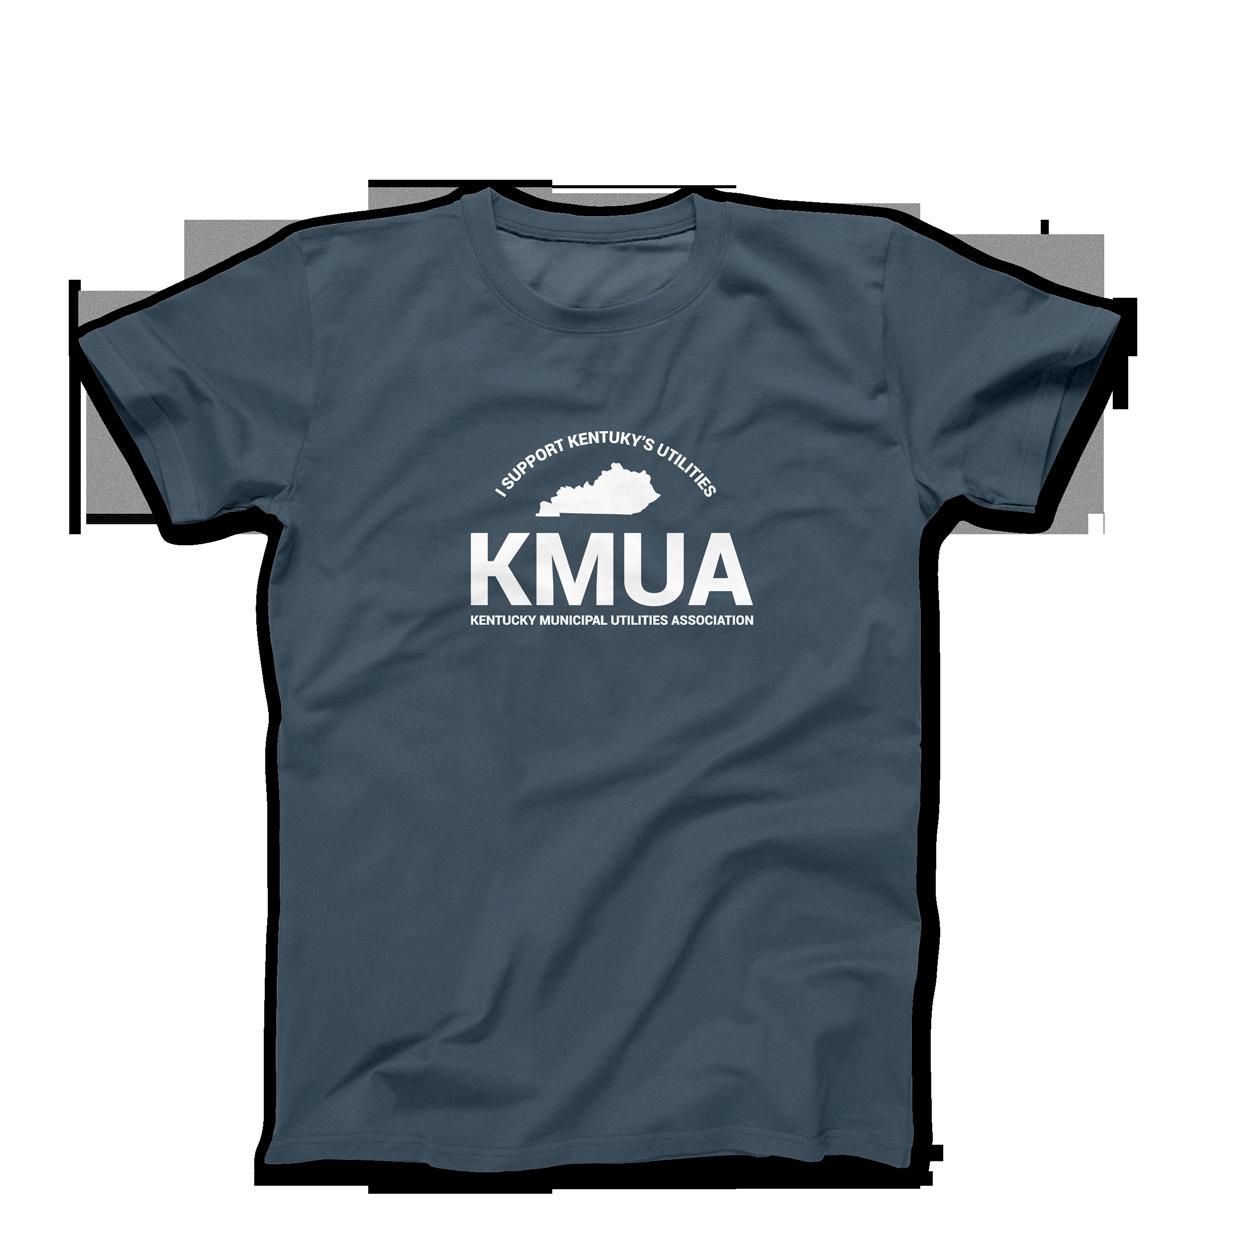 T-Shirt-raised-KMUA.png